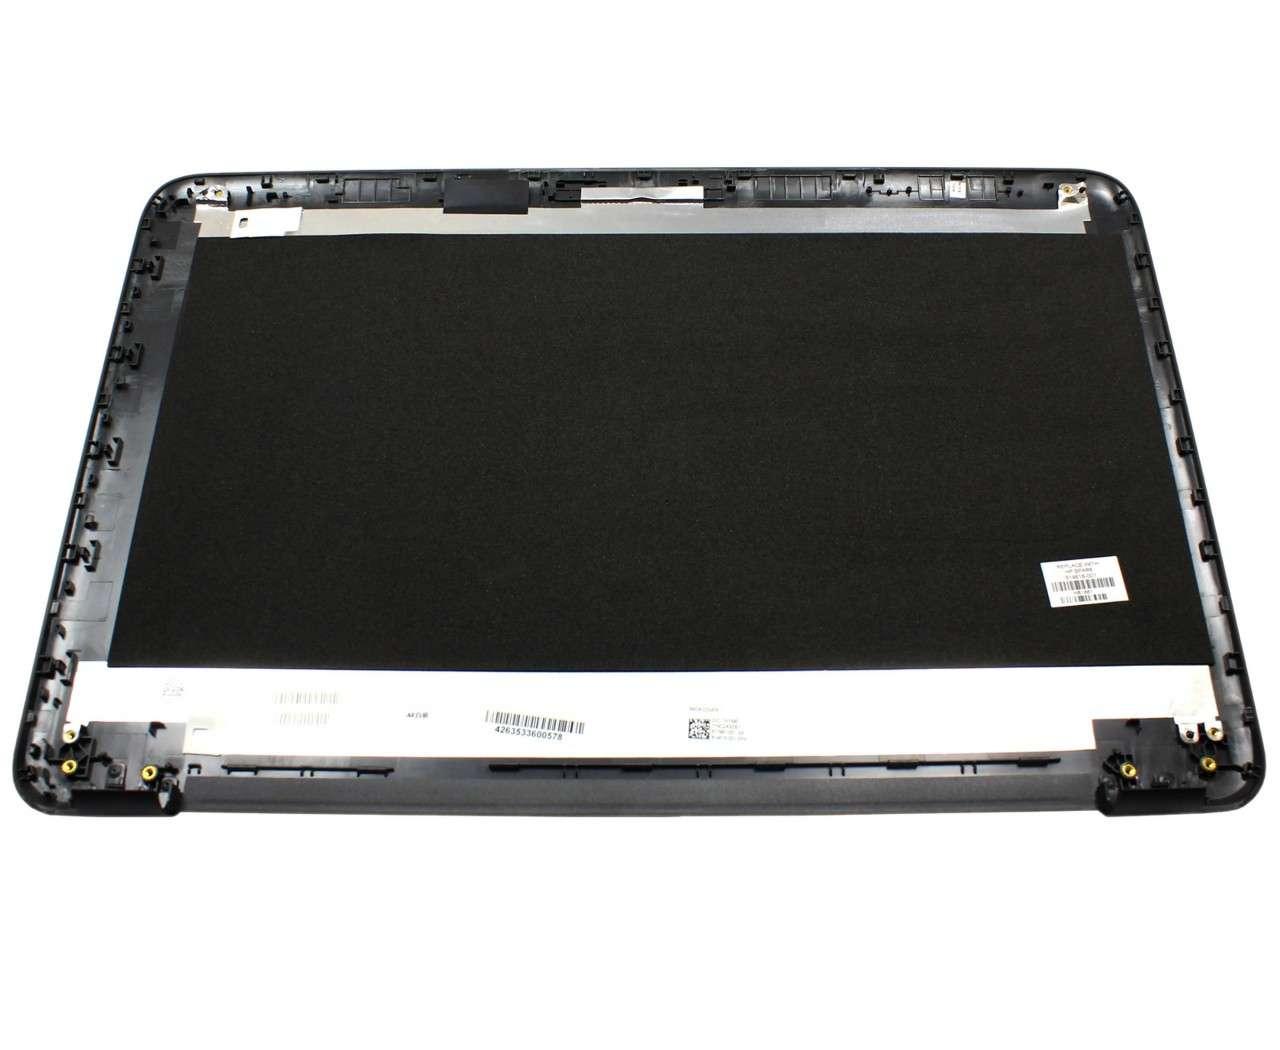 Capac Display BackCover HP 255 G4 Carcasa Display imagine powerlaptop.ro 2021